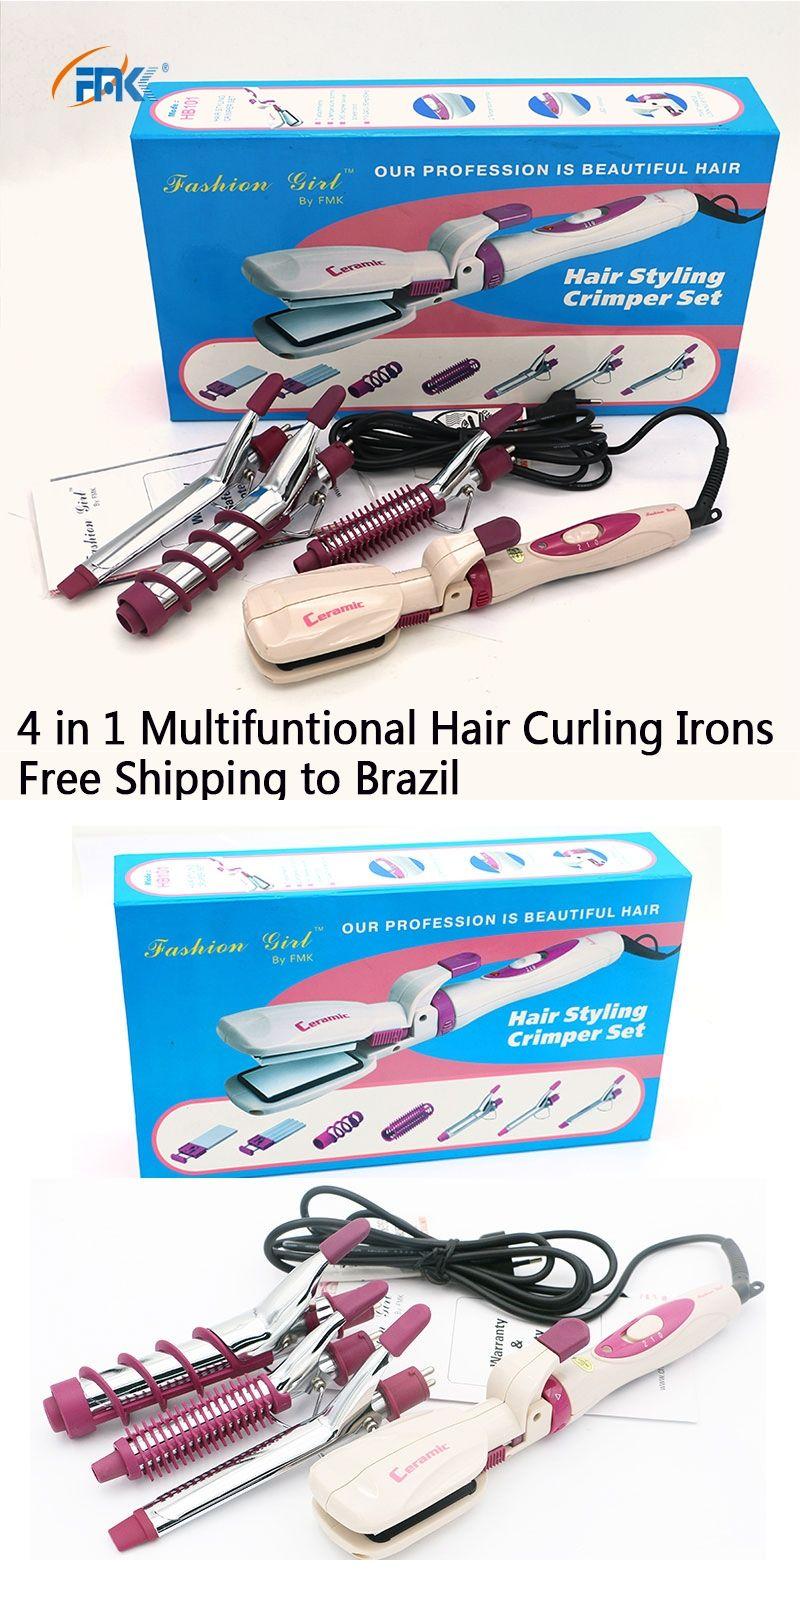 Fmk brand design pro multi function hair curling irons magic curly fmk brand design pro multi function hair curling irons magic curly wand 1set body wave malvernweather Choice Image